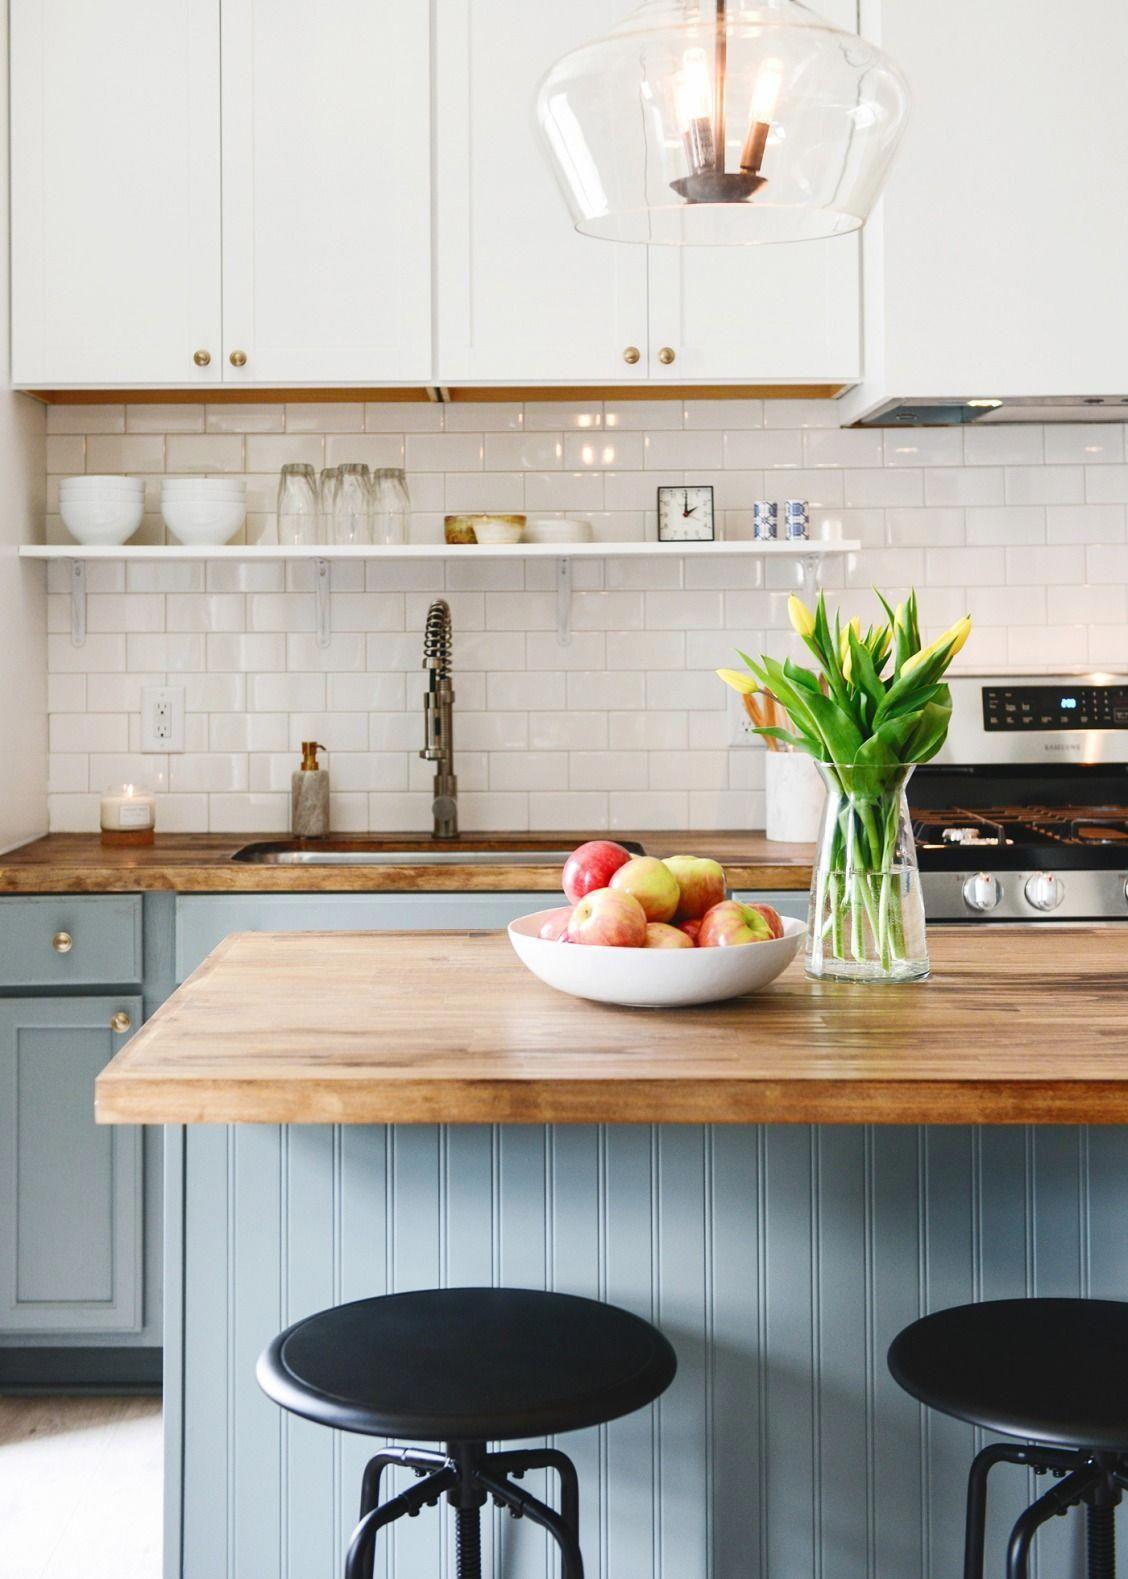 55 Kitchens In L Pictures And Ideas Remont Kuhni Dizajn Kuhon Pereplanirovka Kuhni